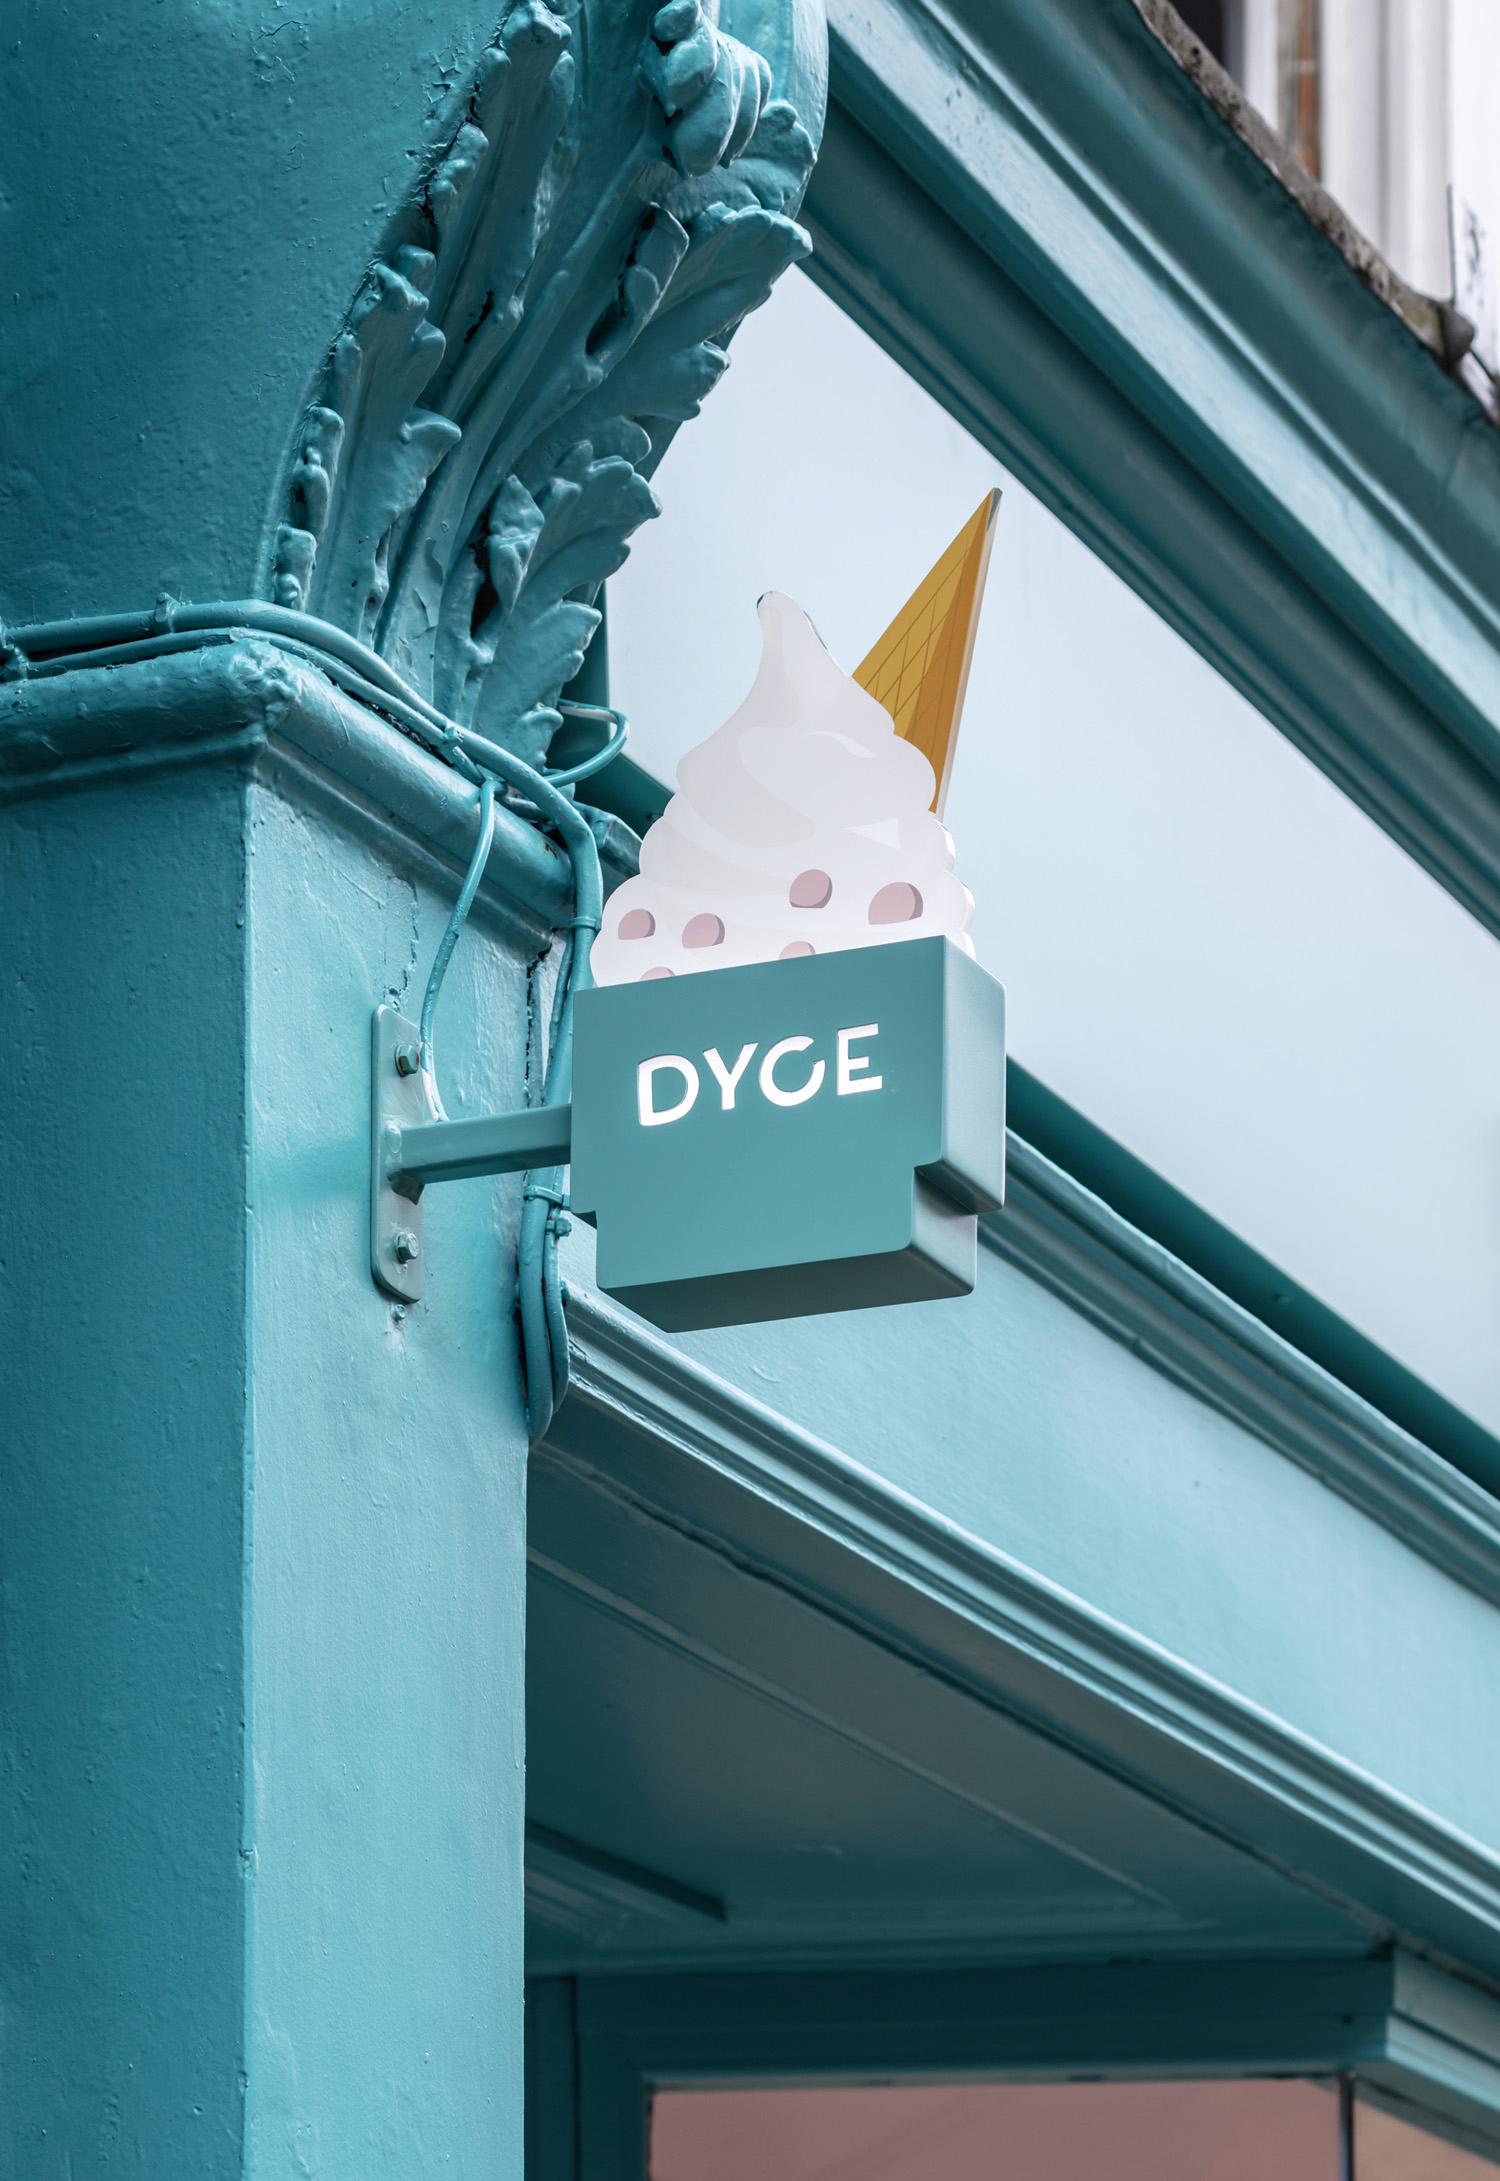 Dyce-51